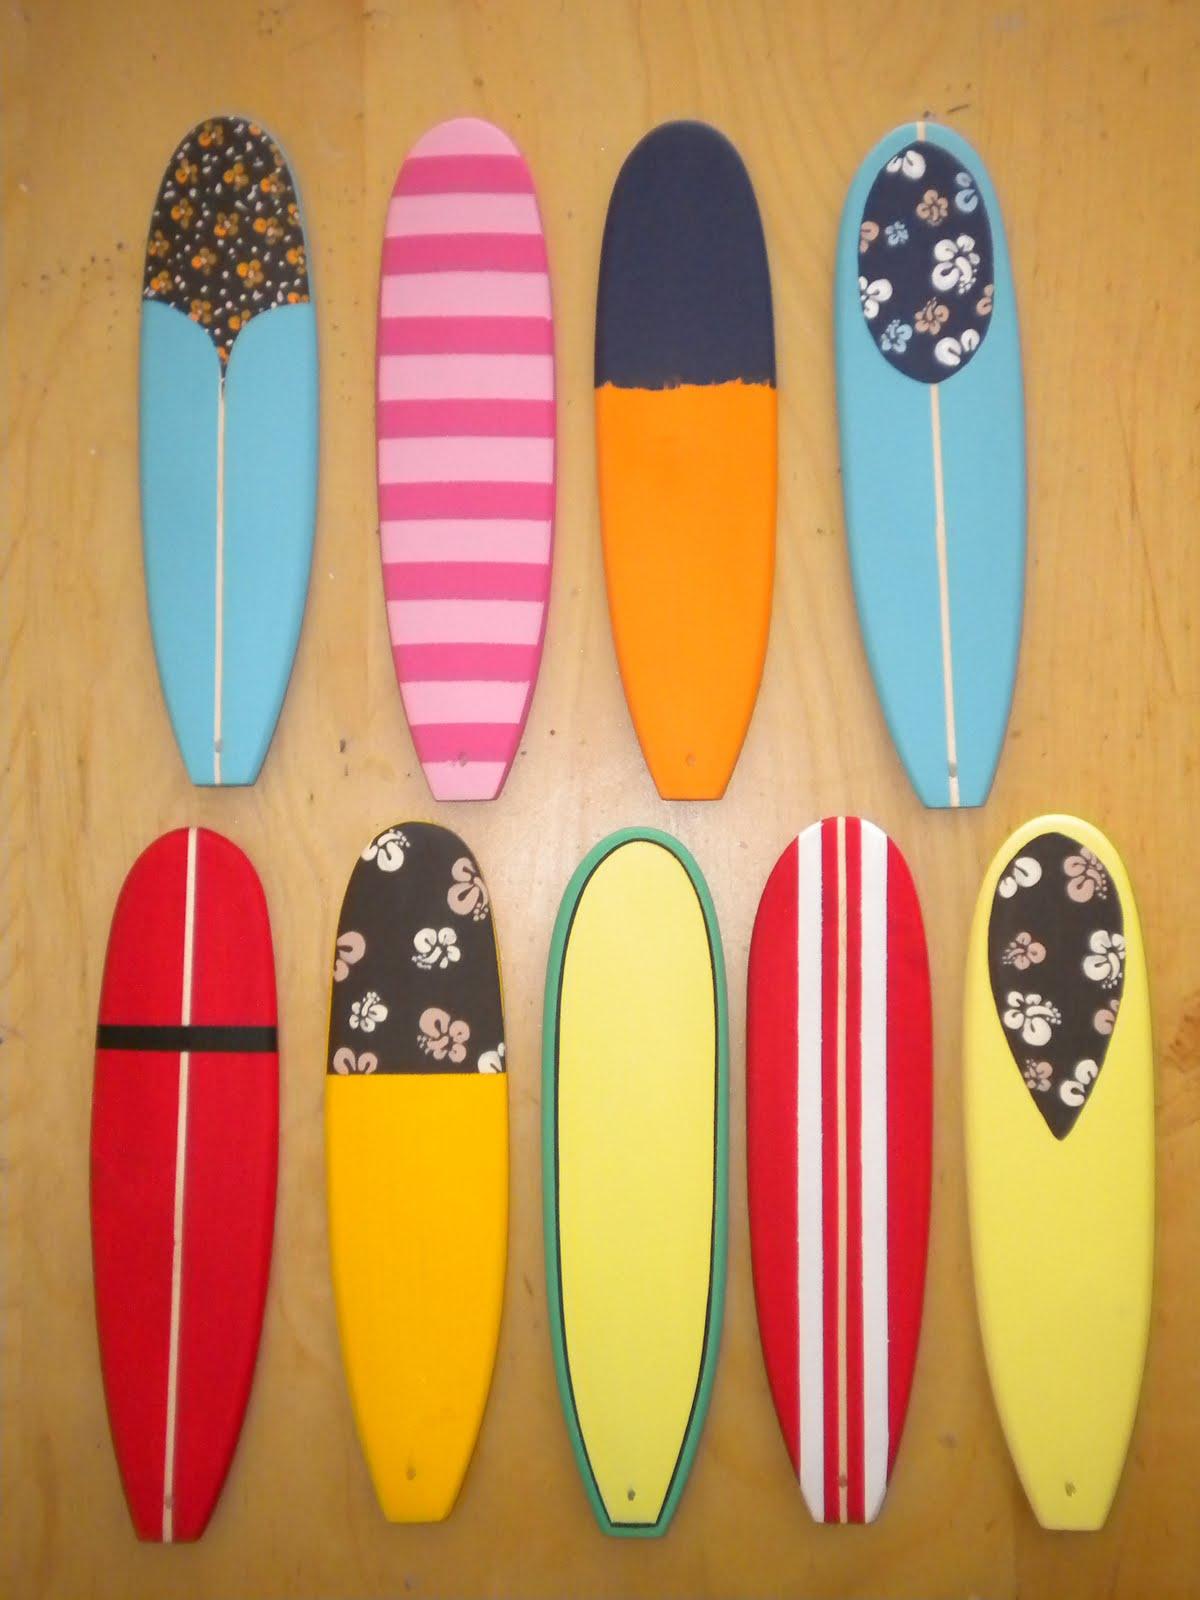 deco surf artesania inciensos decosurf. Black Bedroom Furniture Sets. Home Design Ideas